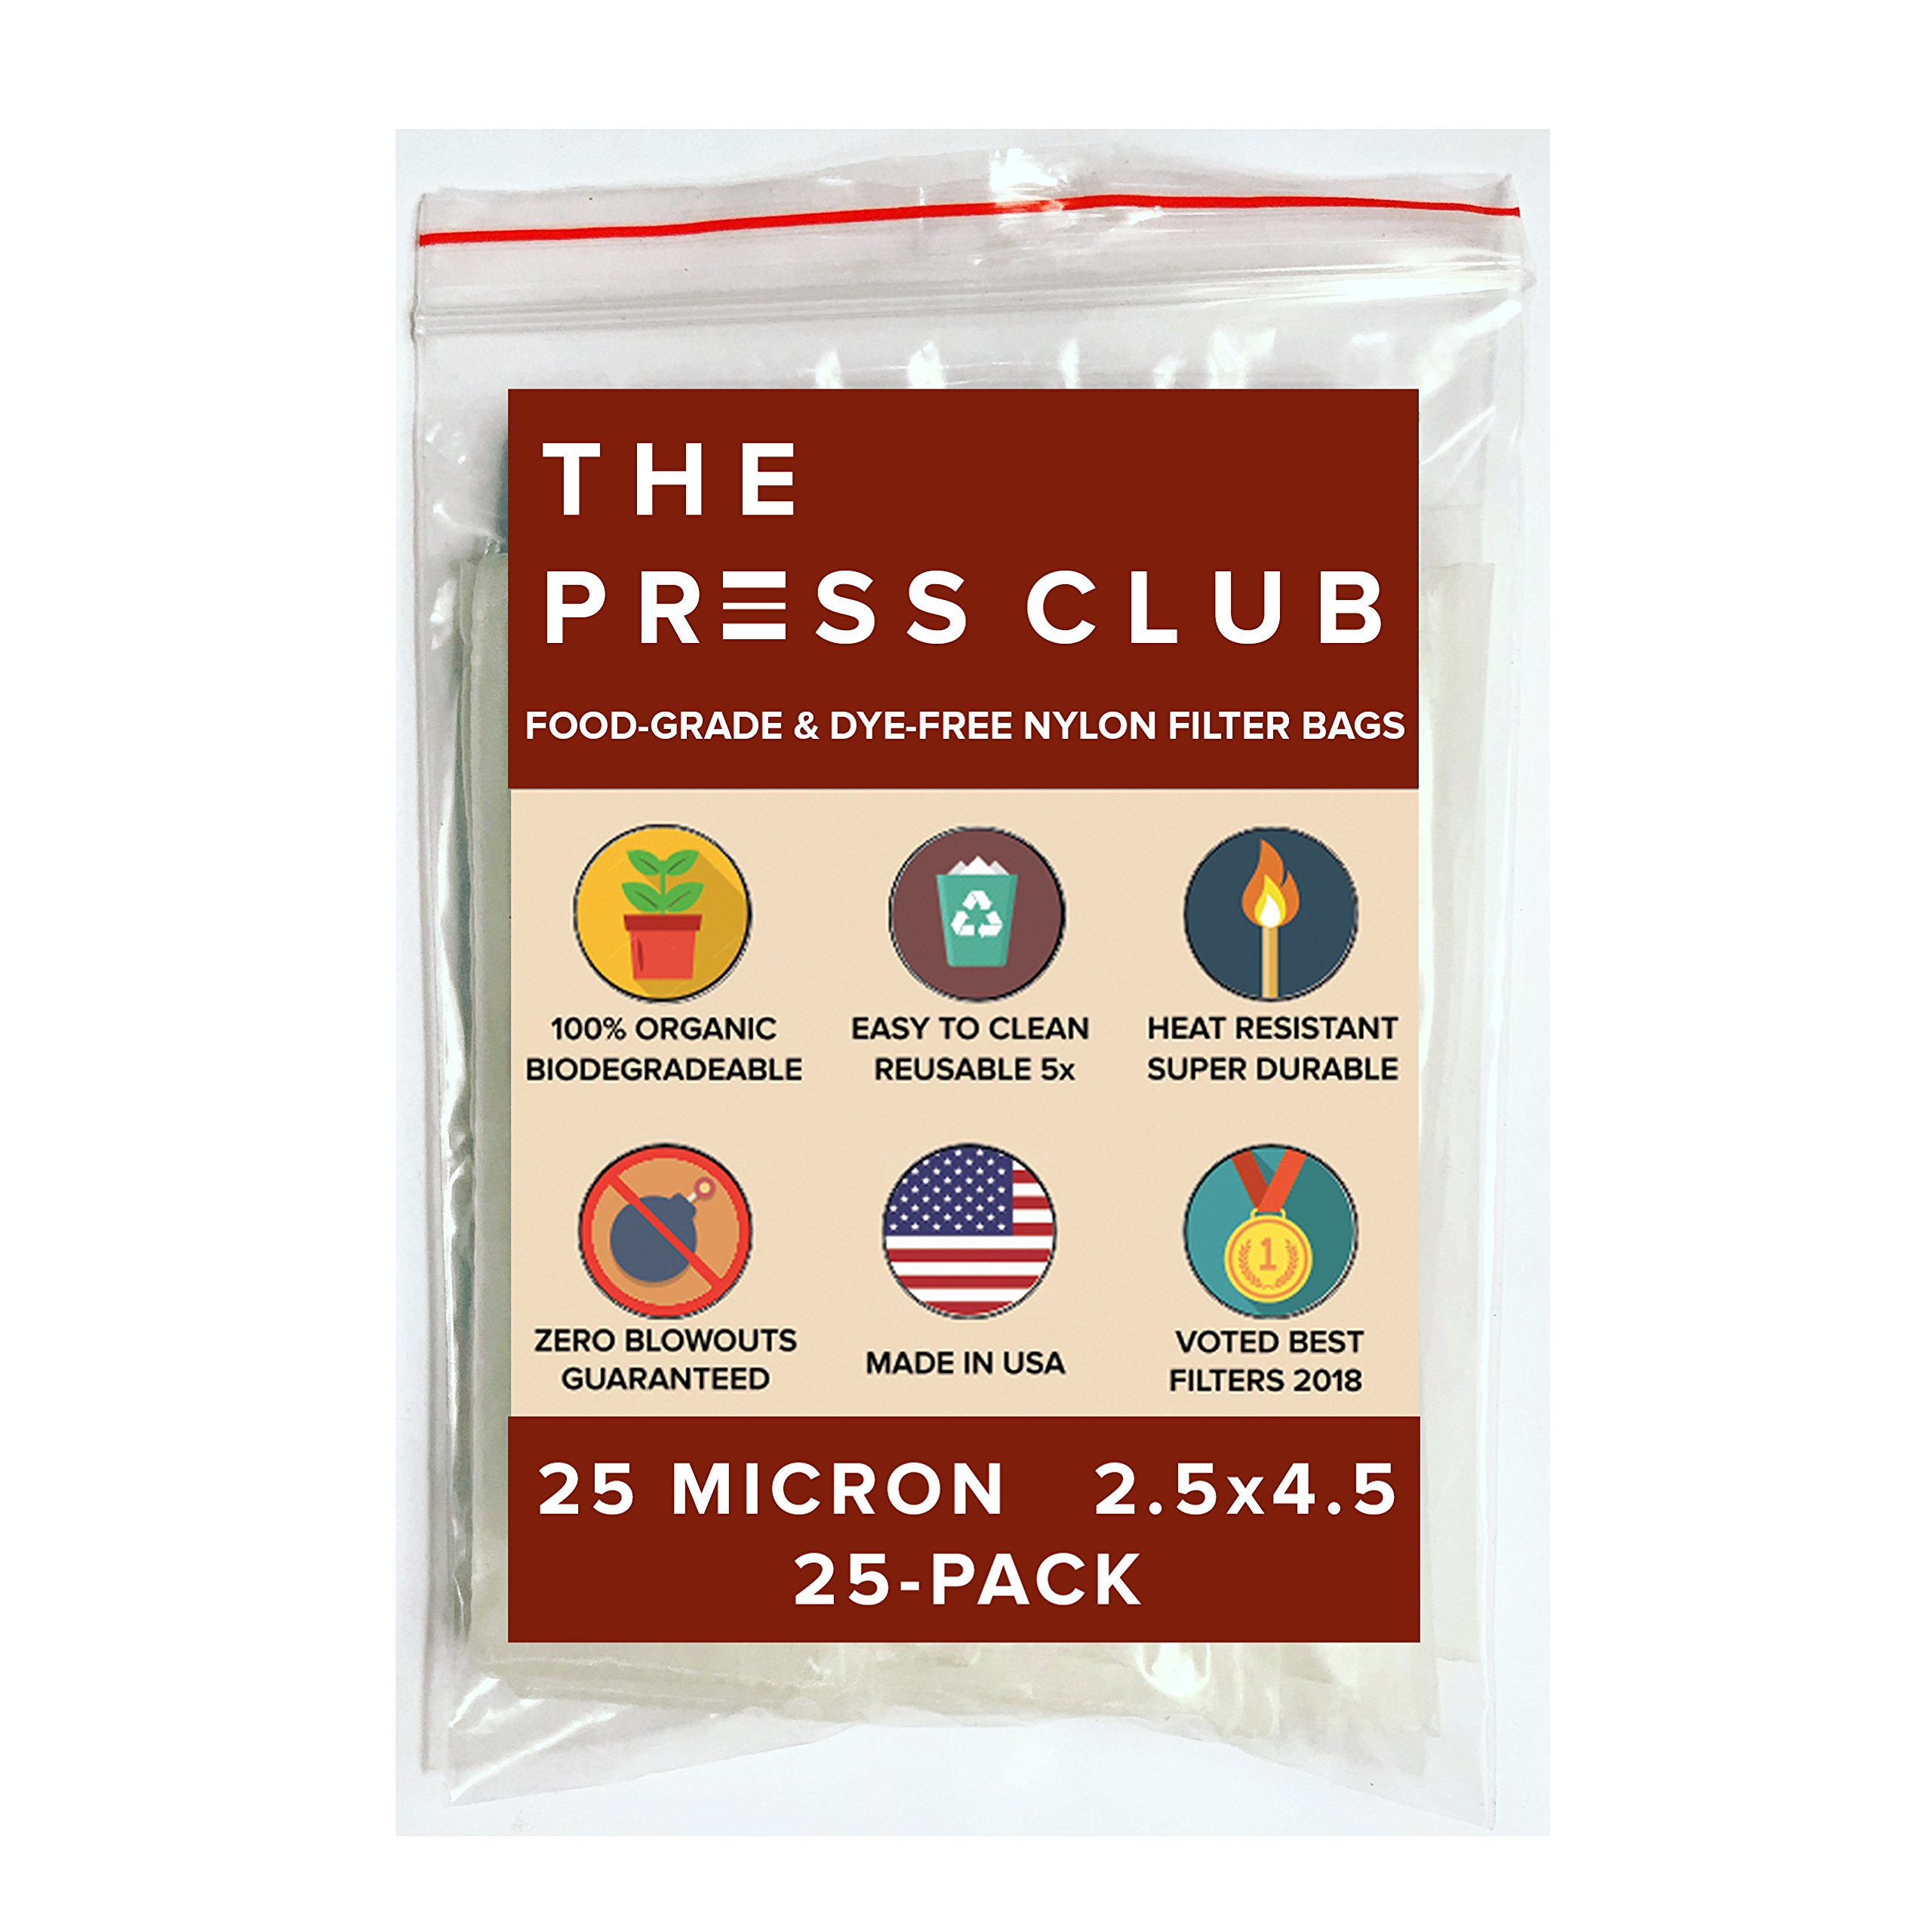 25 Micron • Premium Nylon Rosin Press Tea Filter Bags • 2.5'' x 4.5'' • 25 Pack • Zero Blowout Guarantee • All Micron & Sizes Available